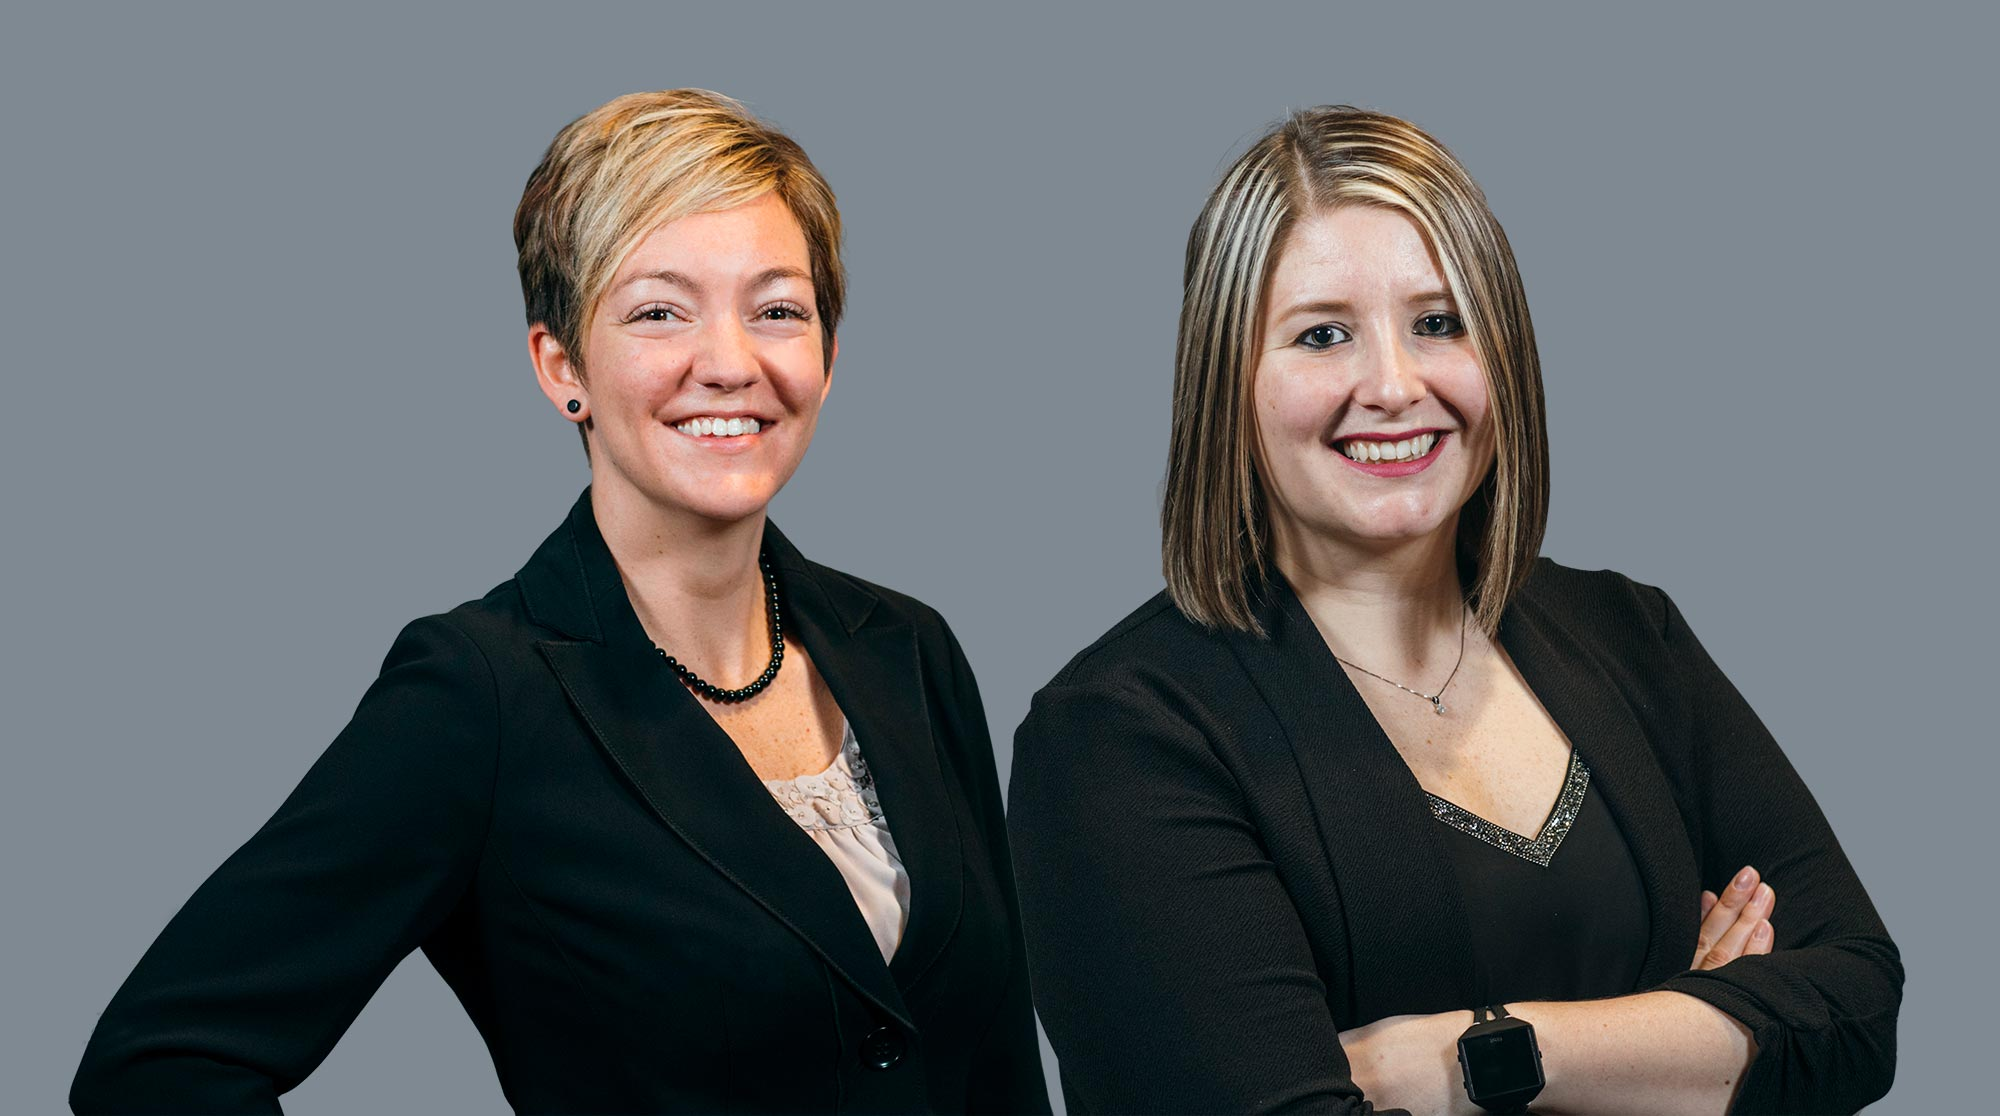 headshots of two women